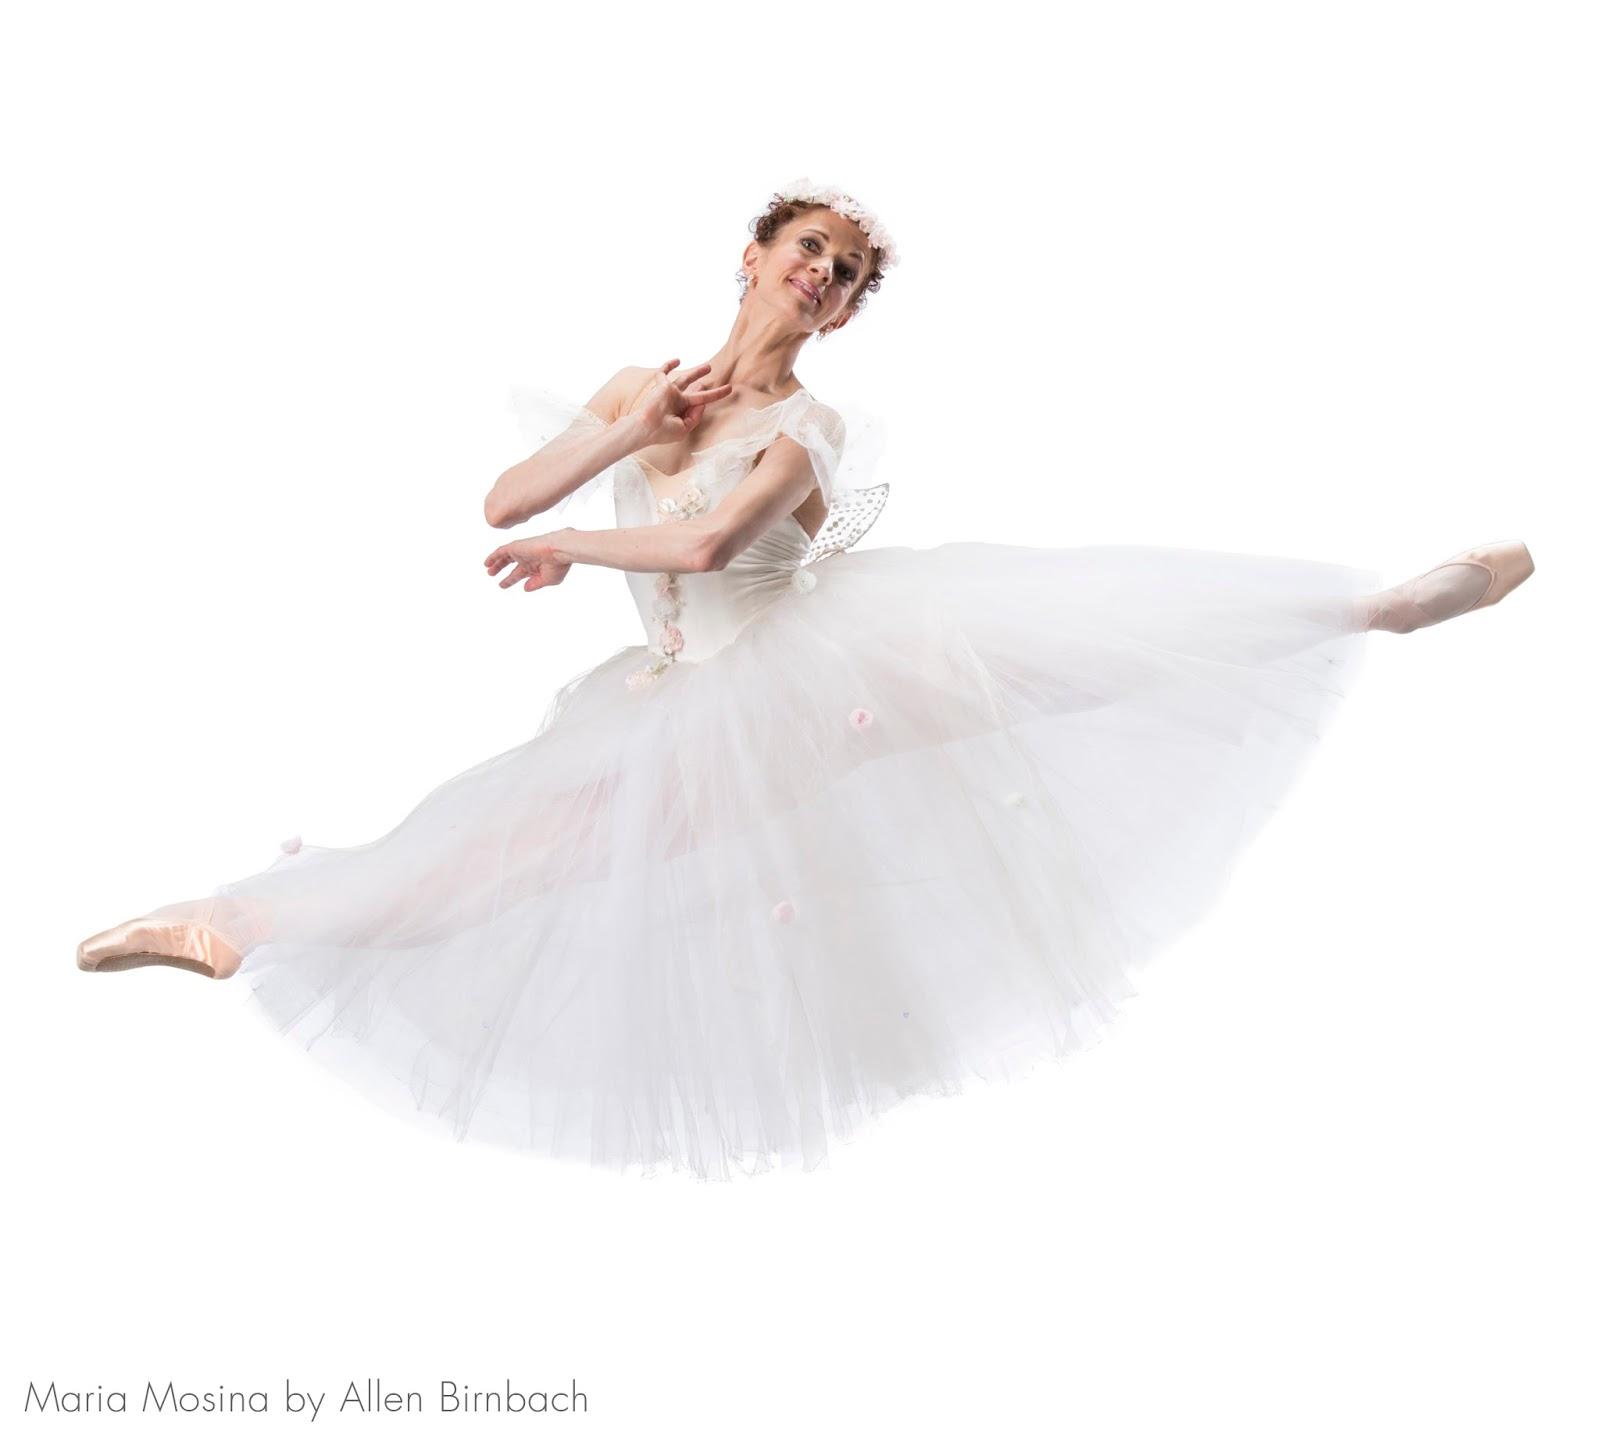 Colorado Ballet Opens Its 55th Season With Romantic